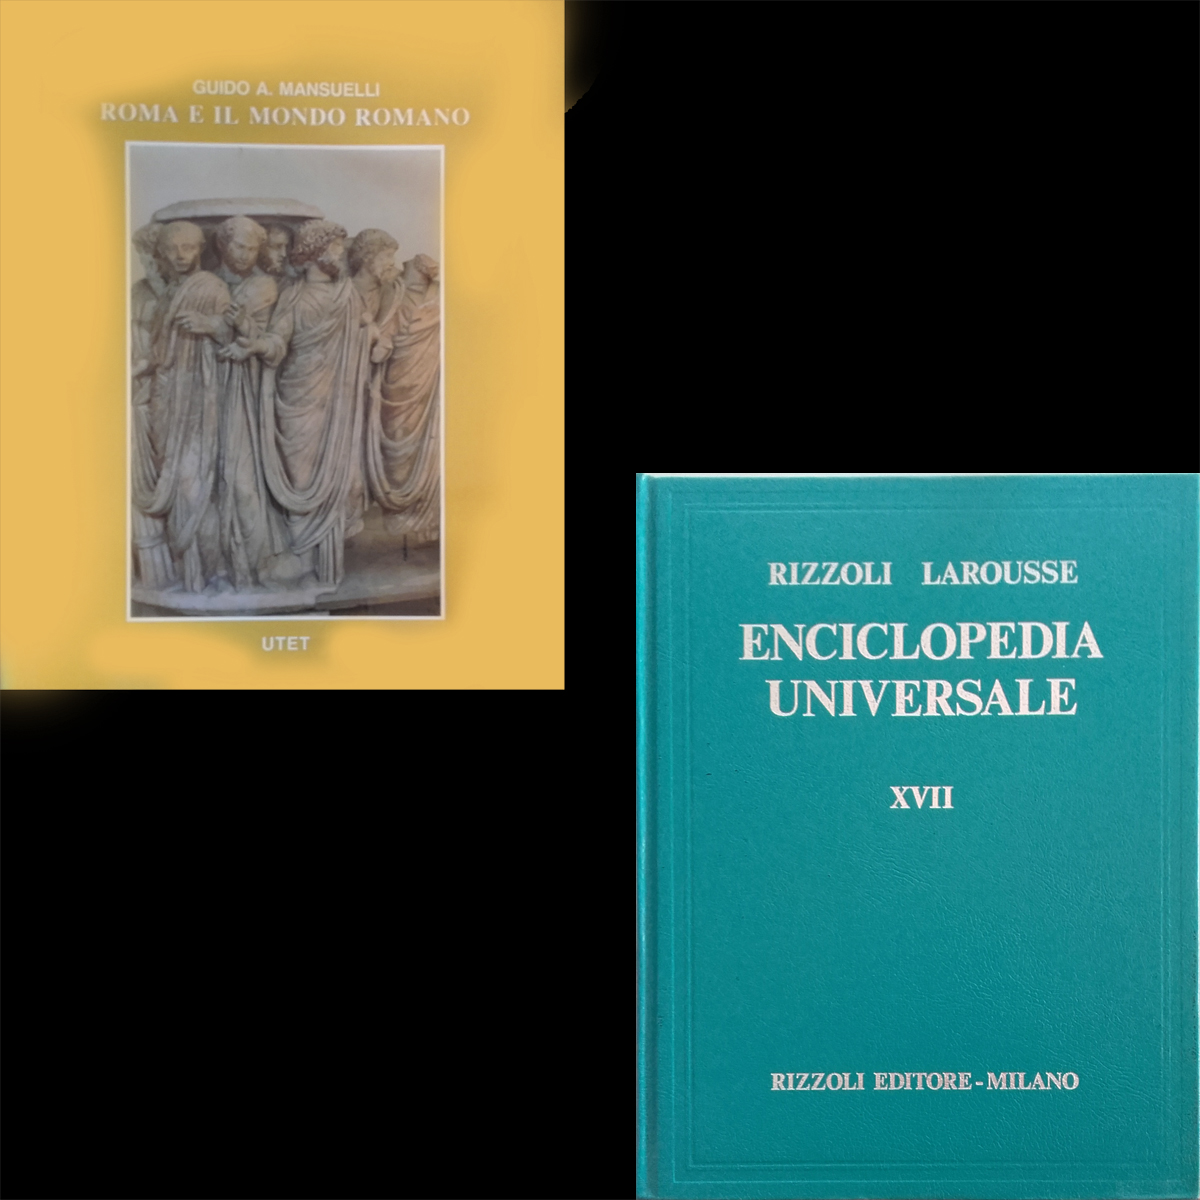 "Enciclopedia ""Arte e archeologia"" e Enciclopedia ""Universale"" Rizzoli Larousse"